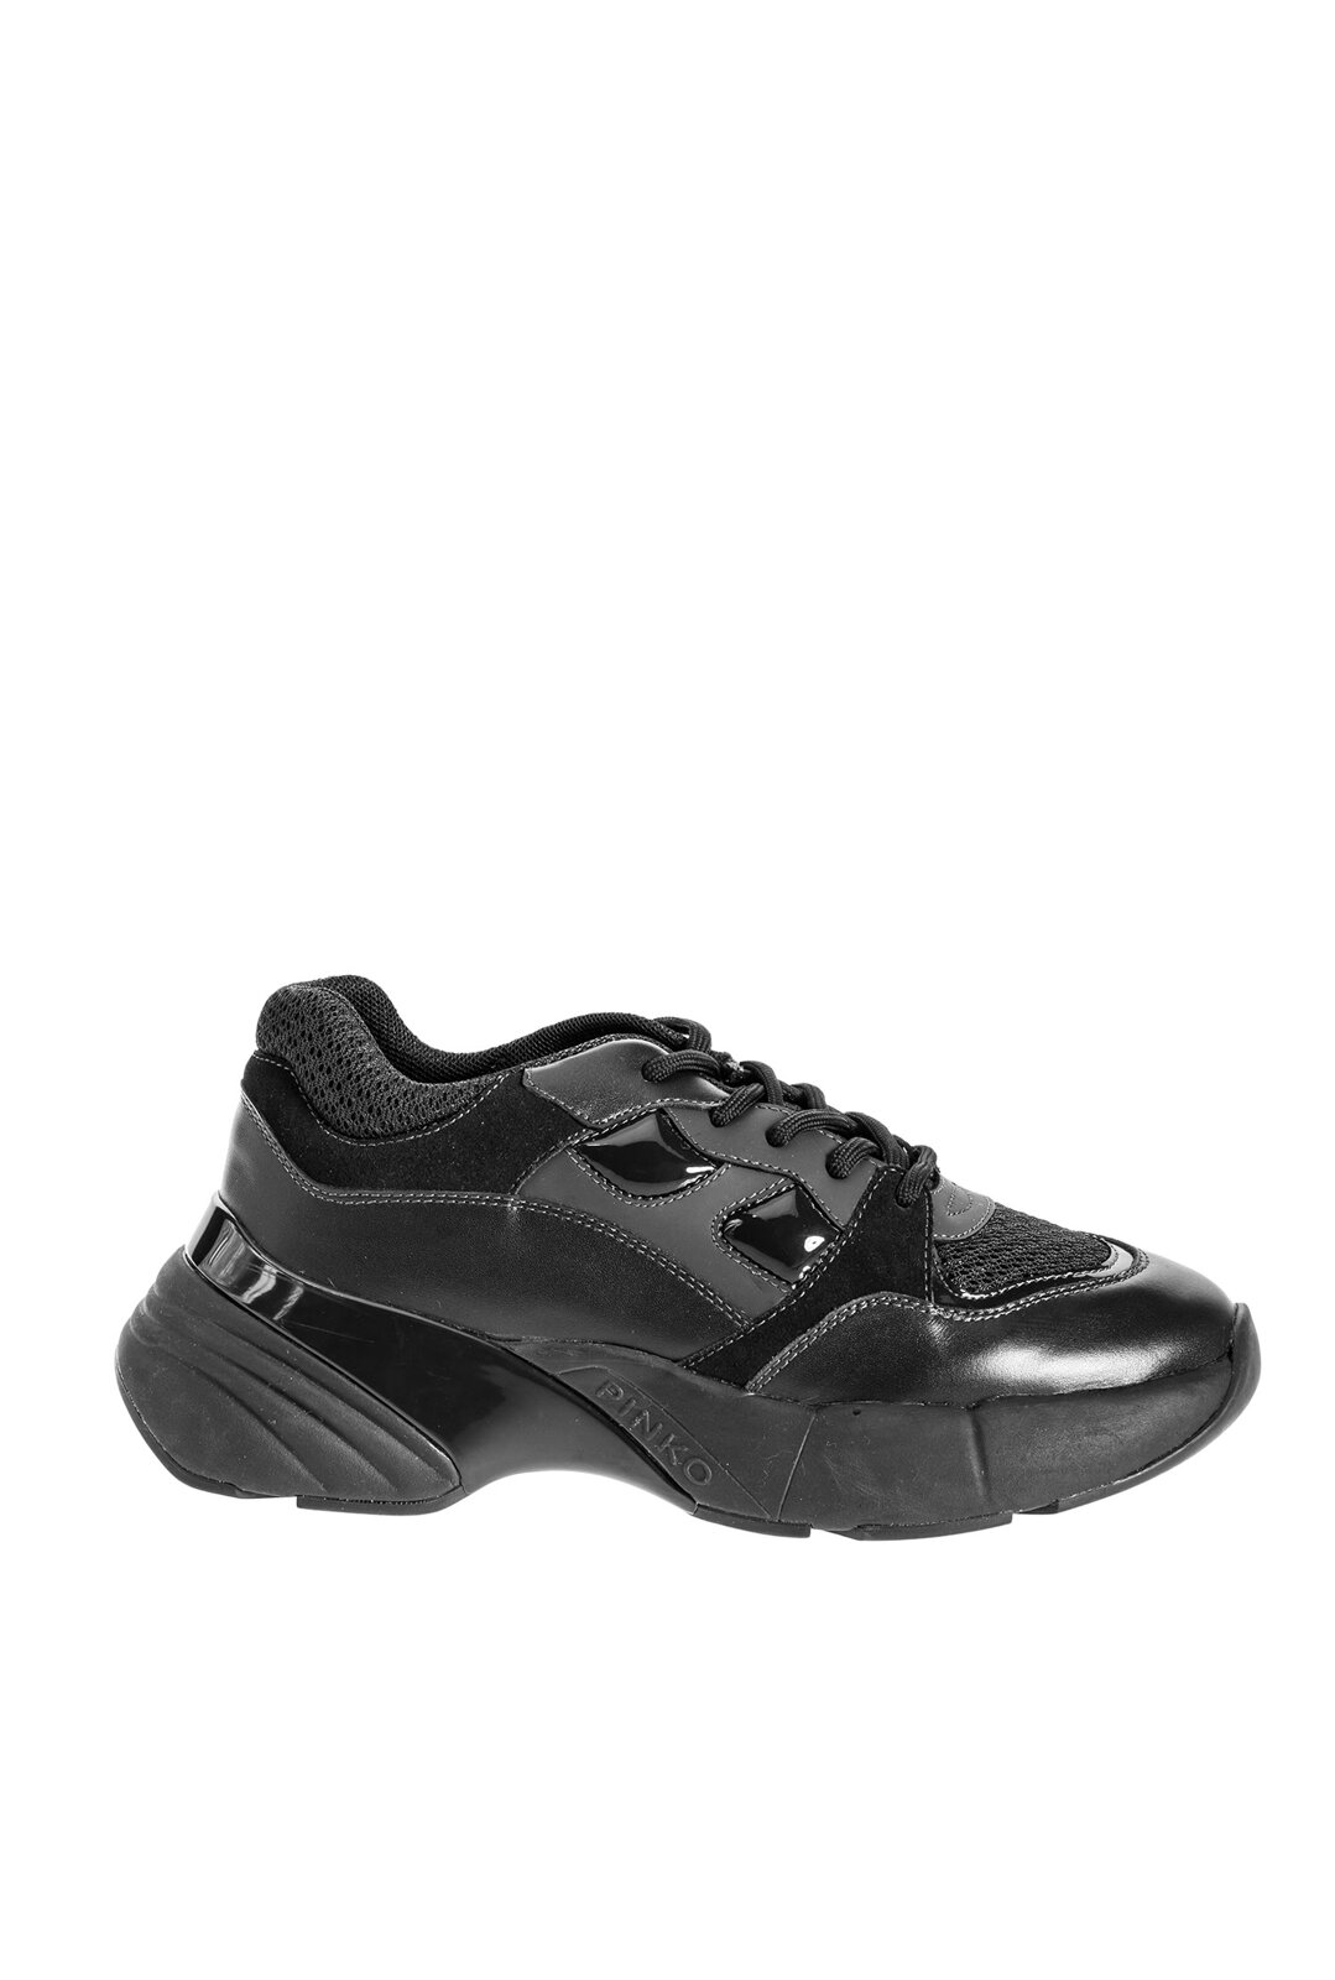 Oversize Sneakers Monochrome - Pinko